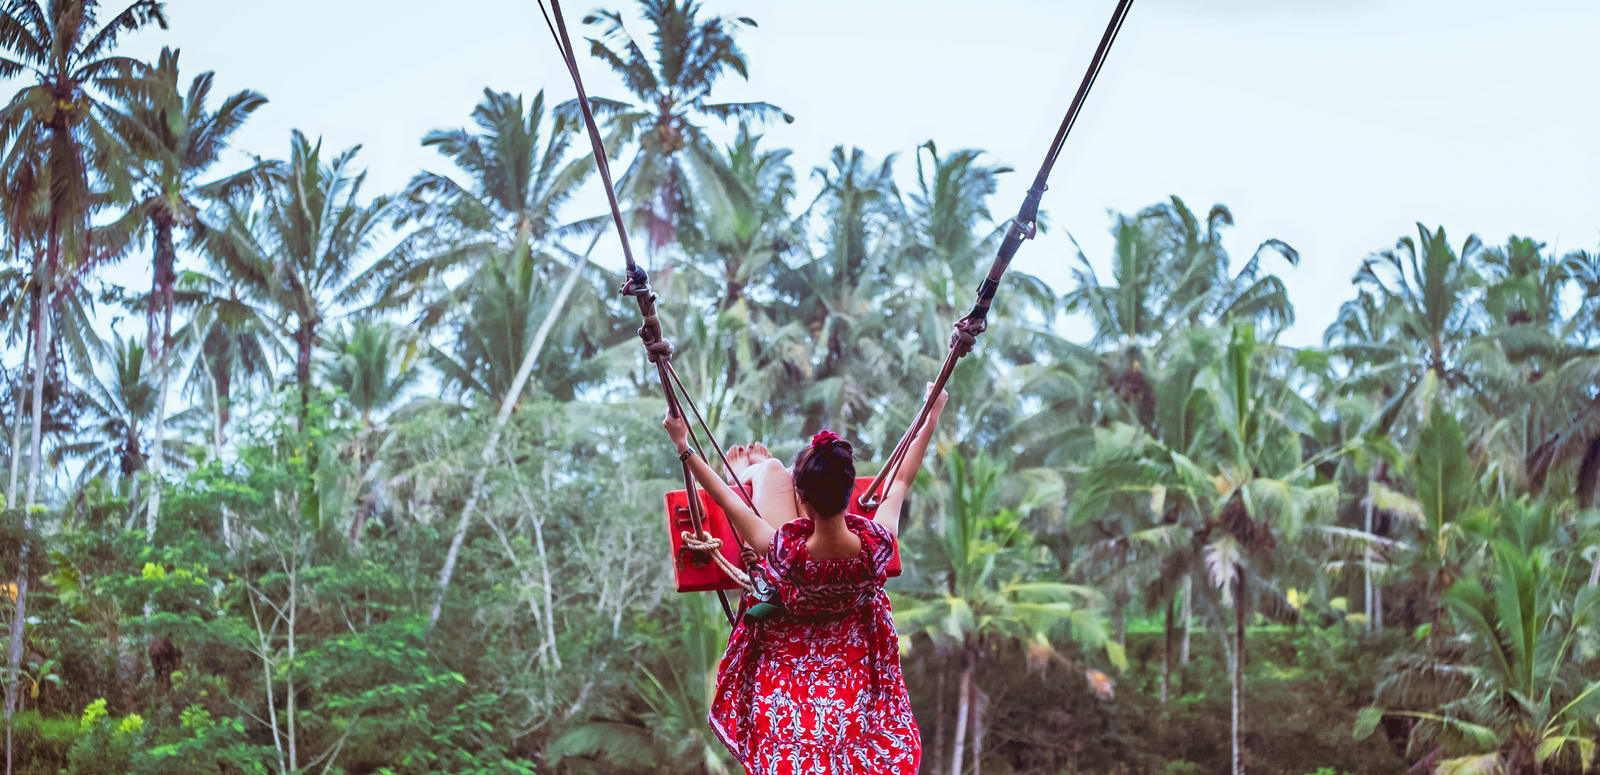 Bali Swing In Ubud Flat 20 Off